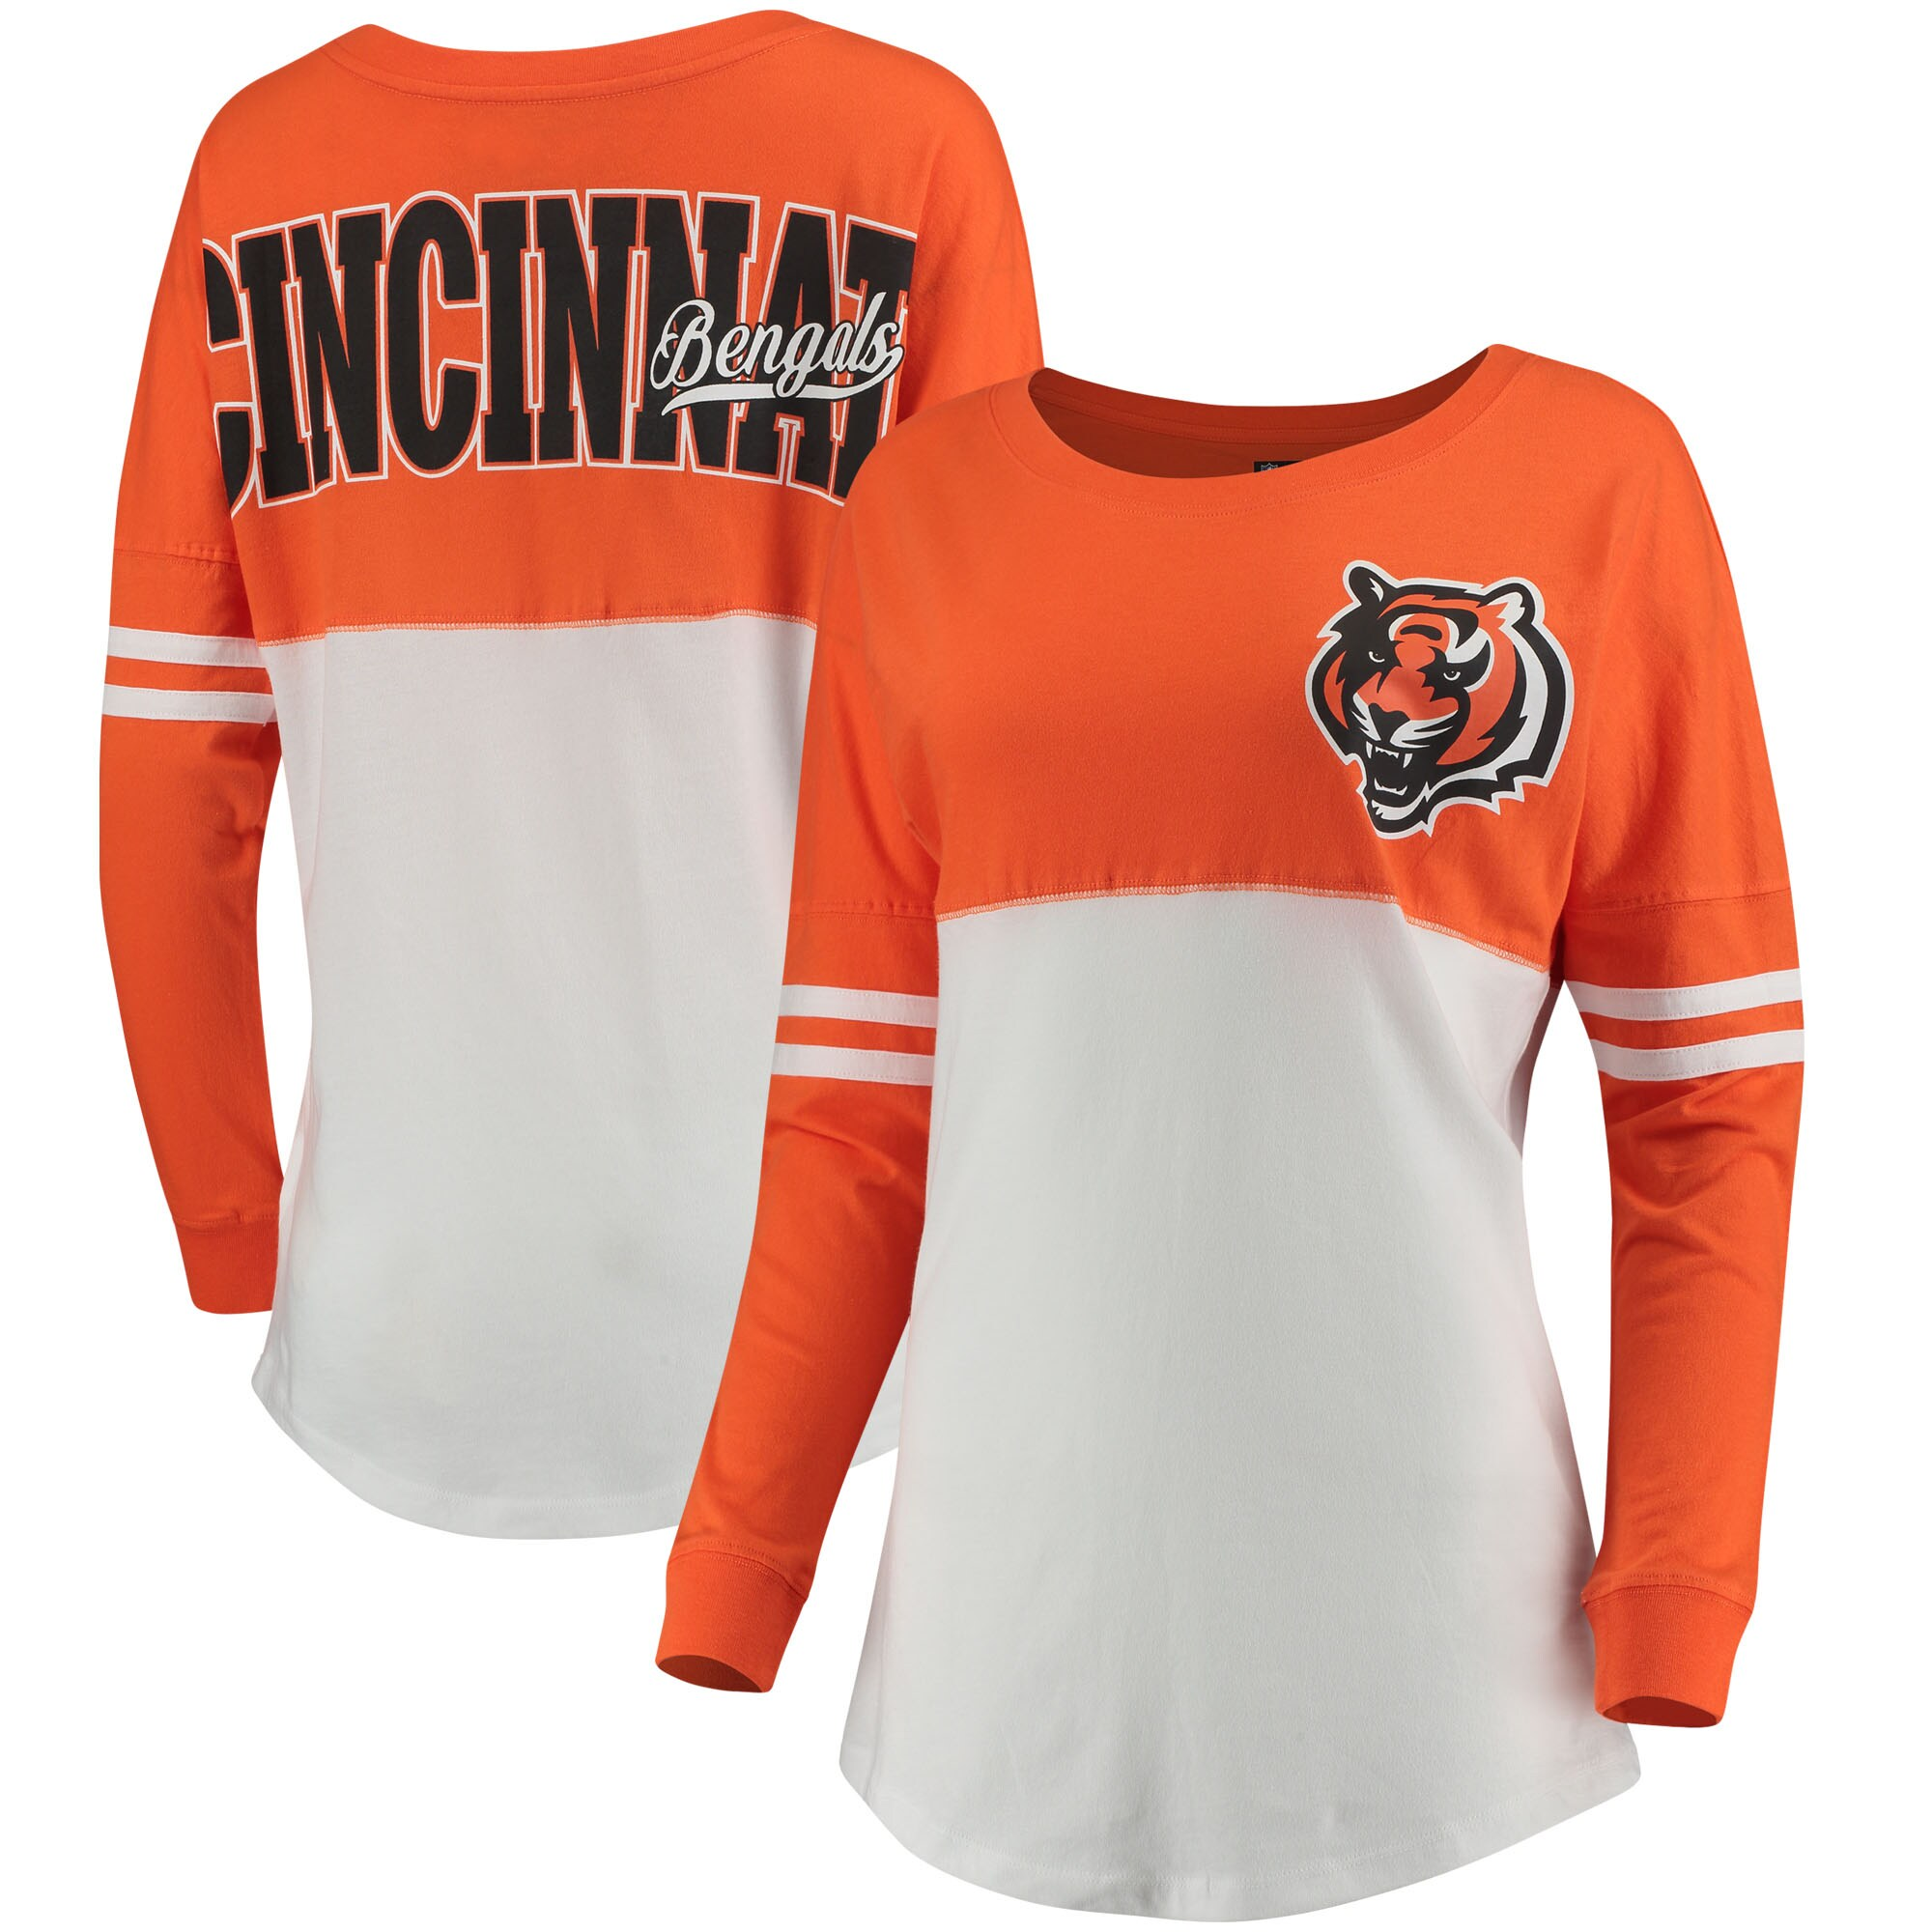 Cincinnati Bengals 5th & Ocean by New Era Women's Team Logo Athletic Varsity Long Sleeve T-Shirt - Orange/White